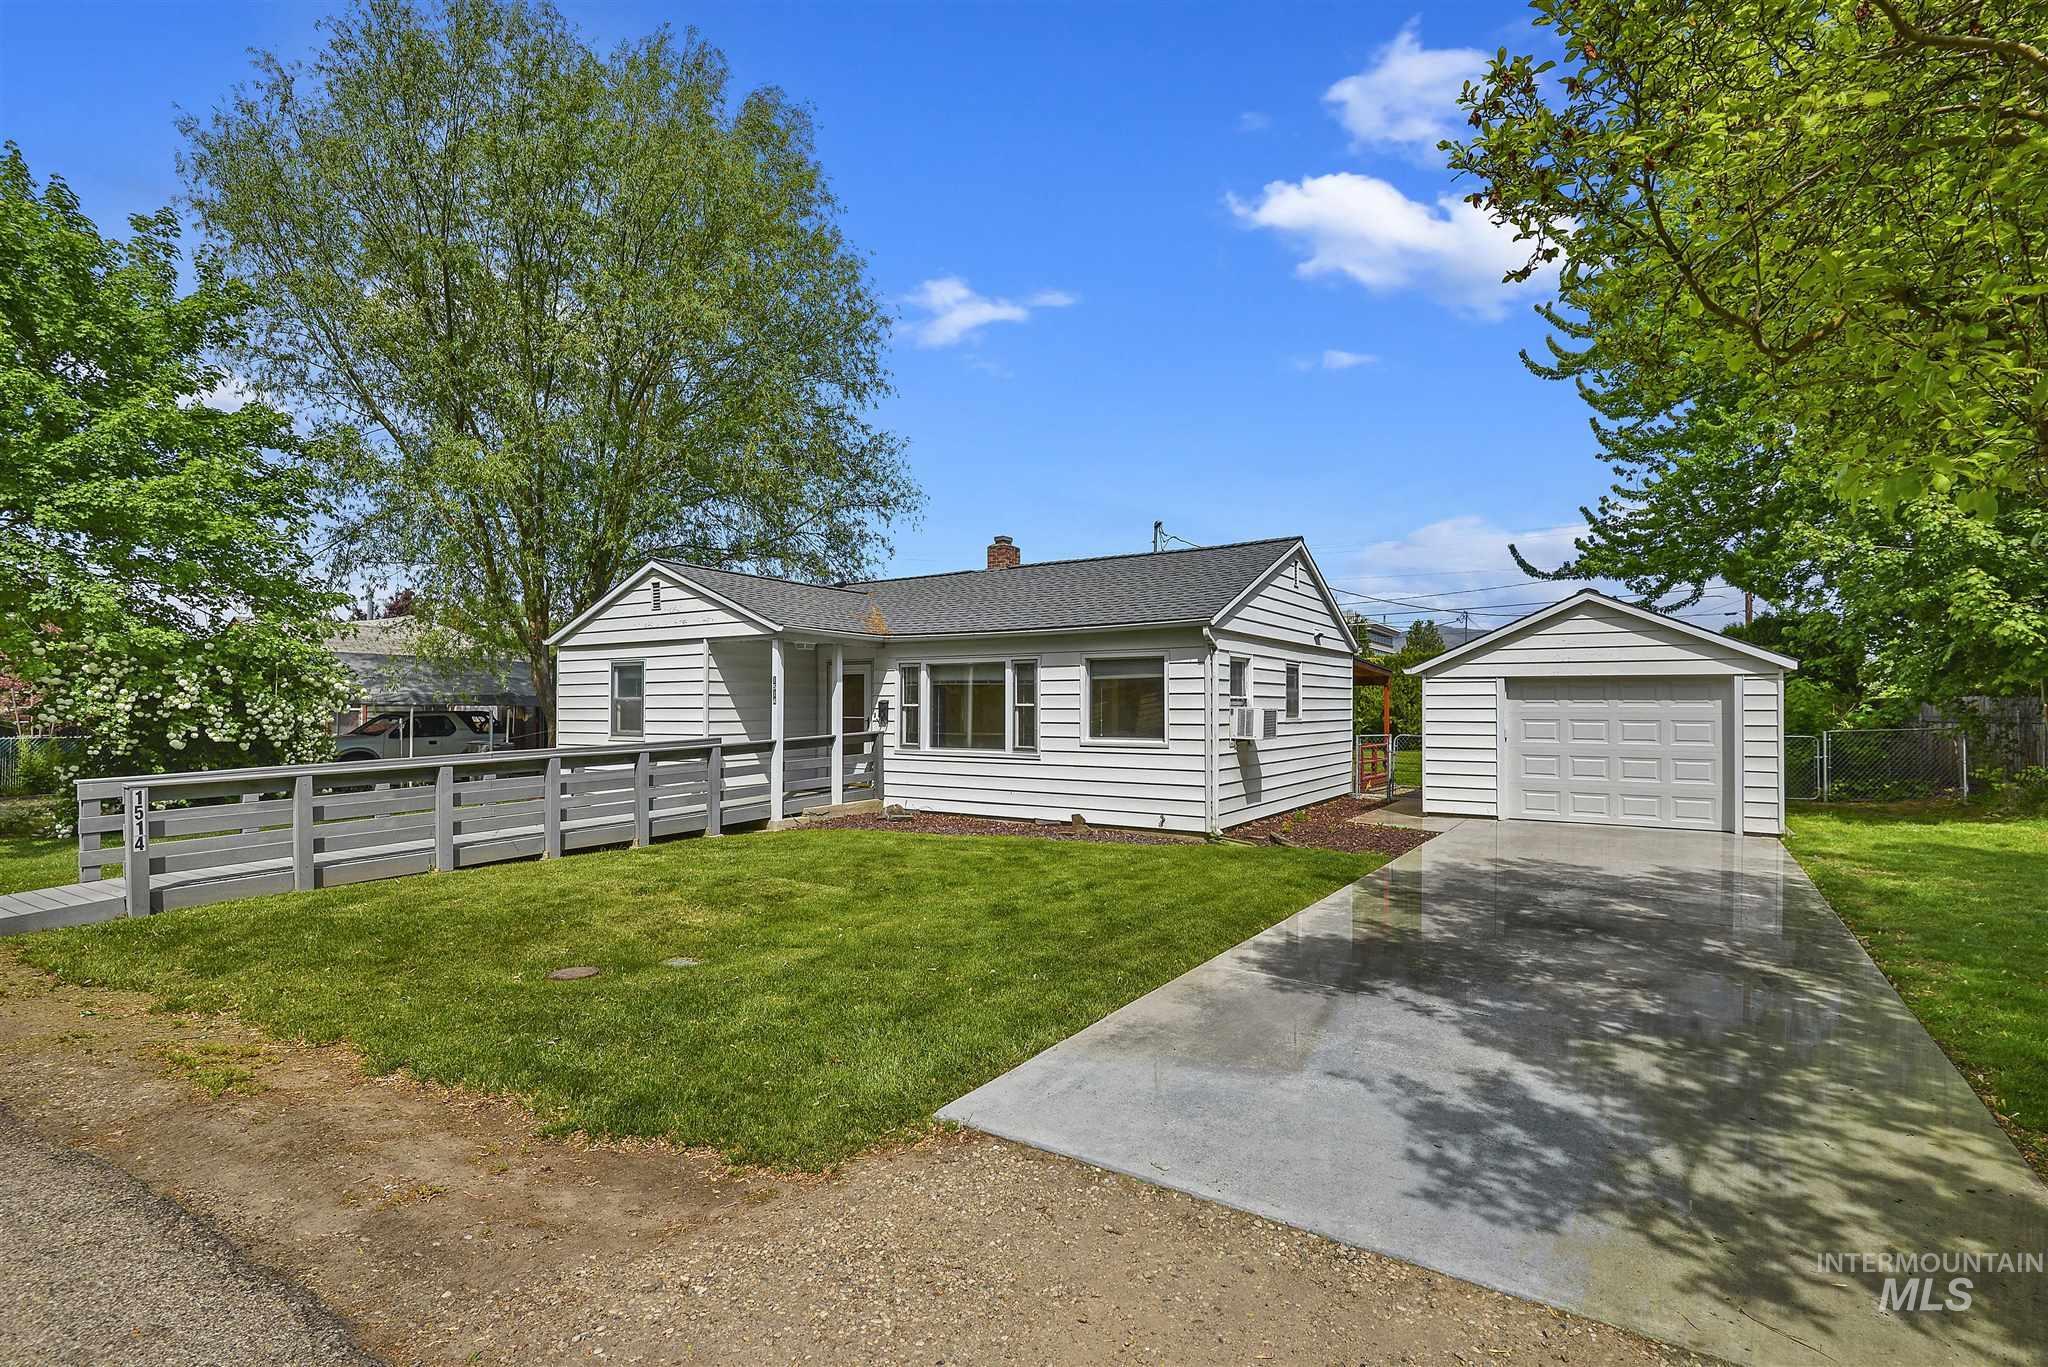 1514 S Loveland St. Property Photo - Boise, ID real estate listing